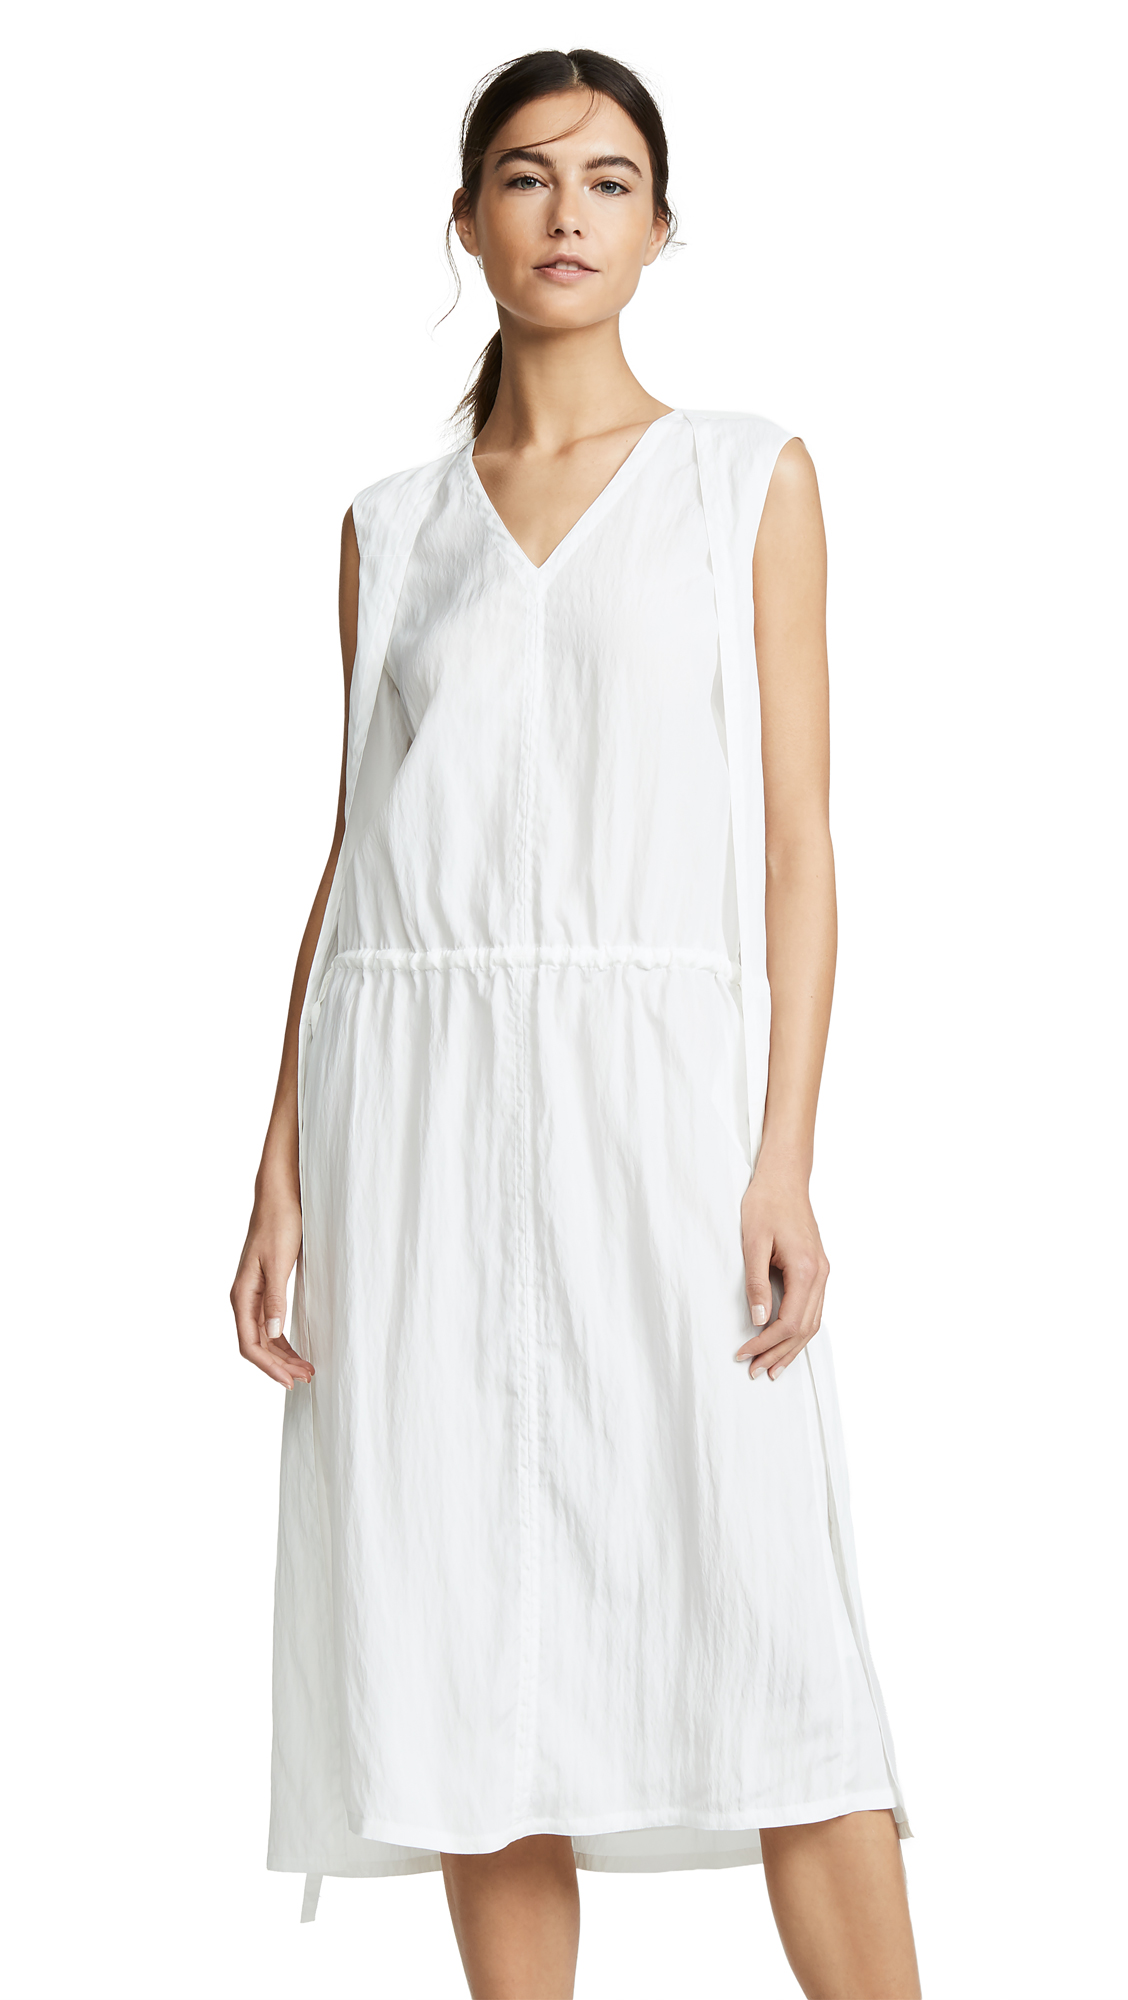 Helmut Lang Sheer Parachute Dress - White